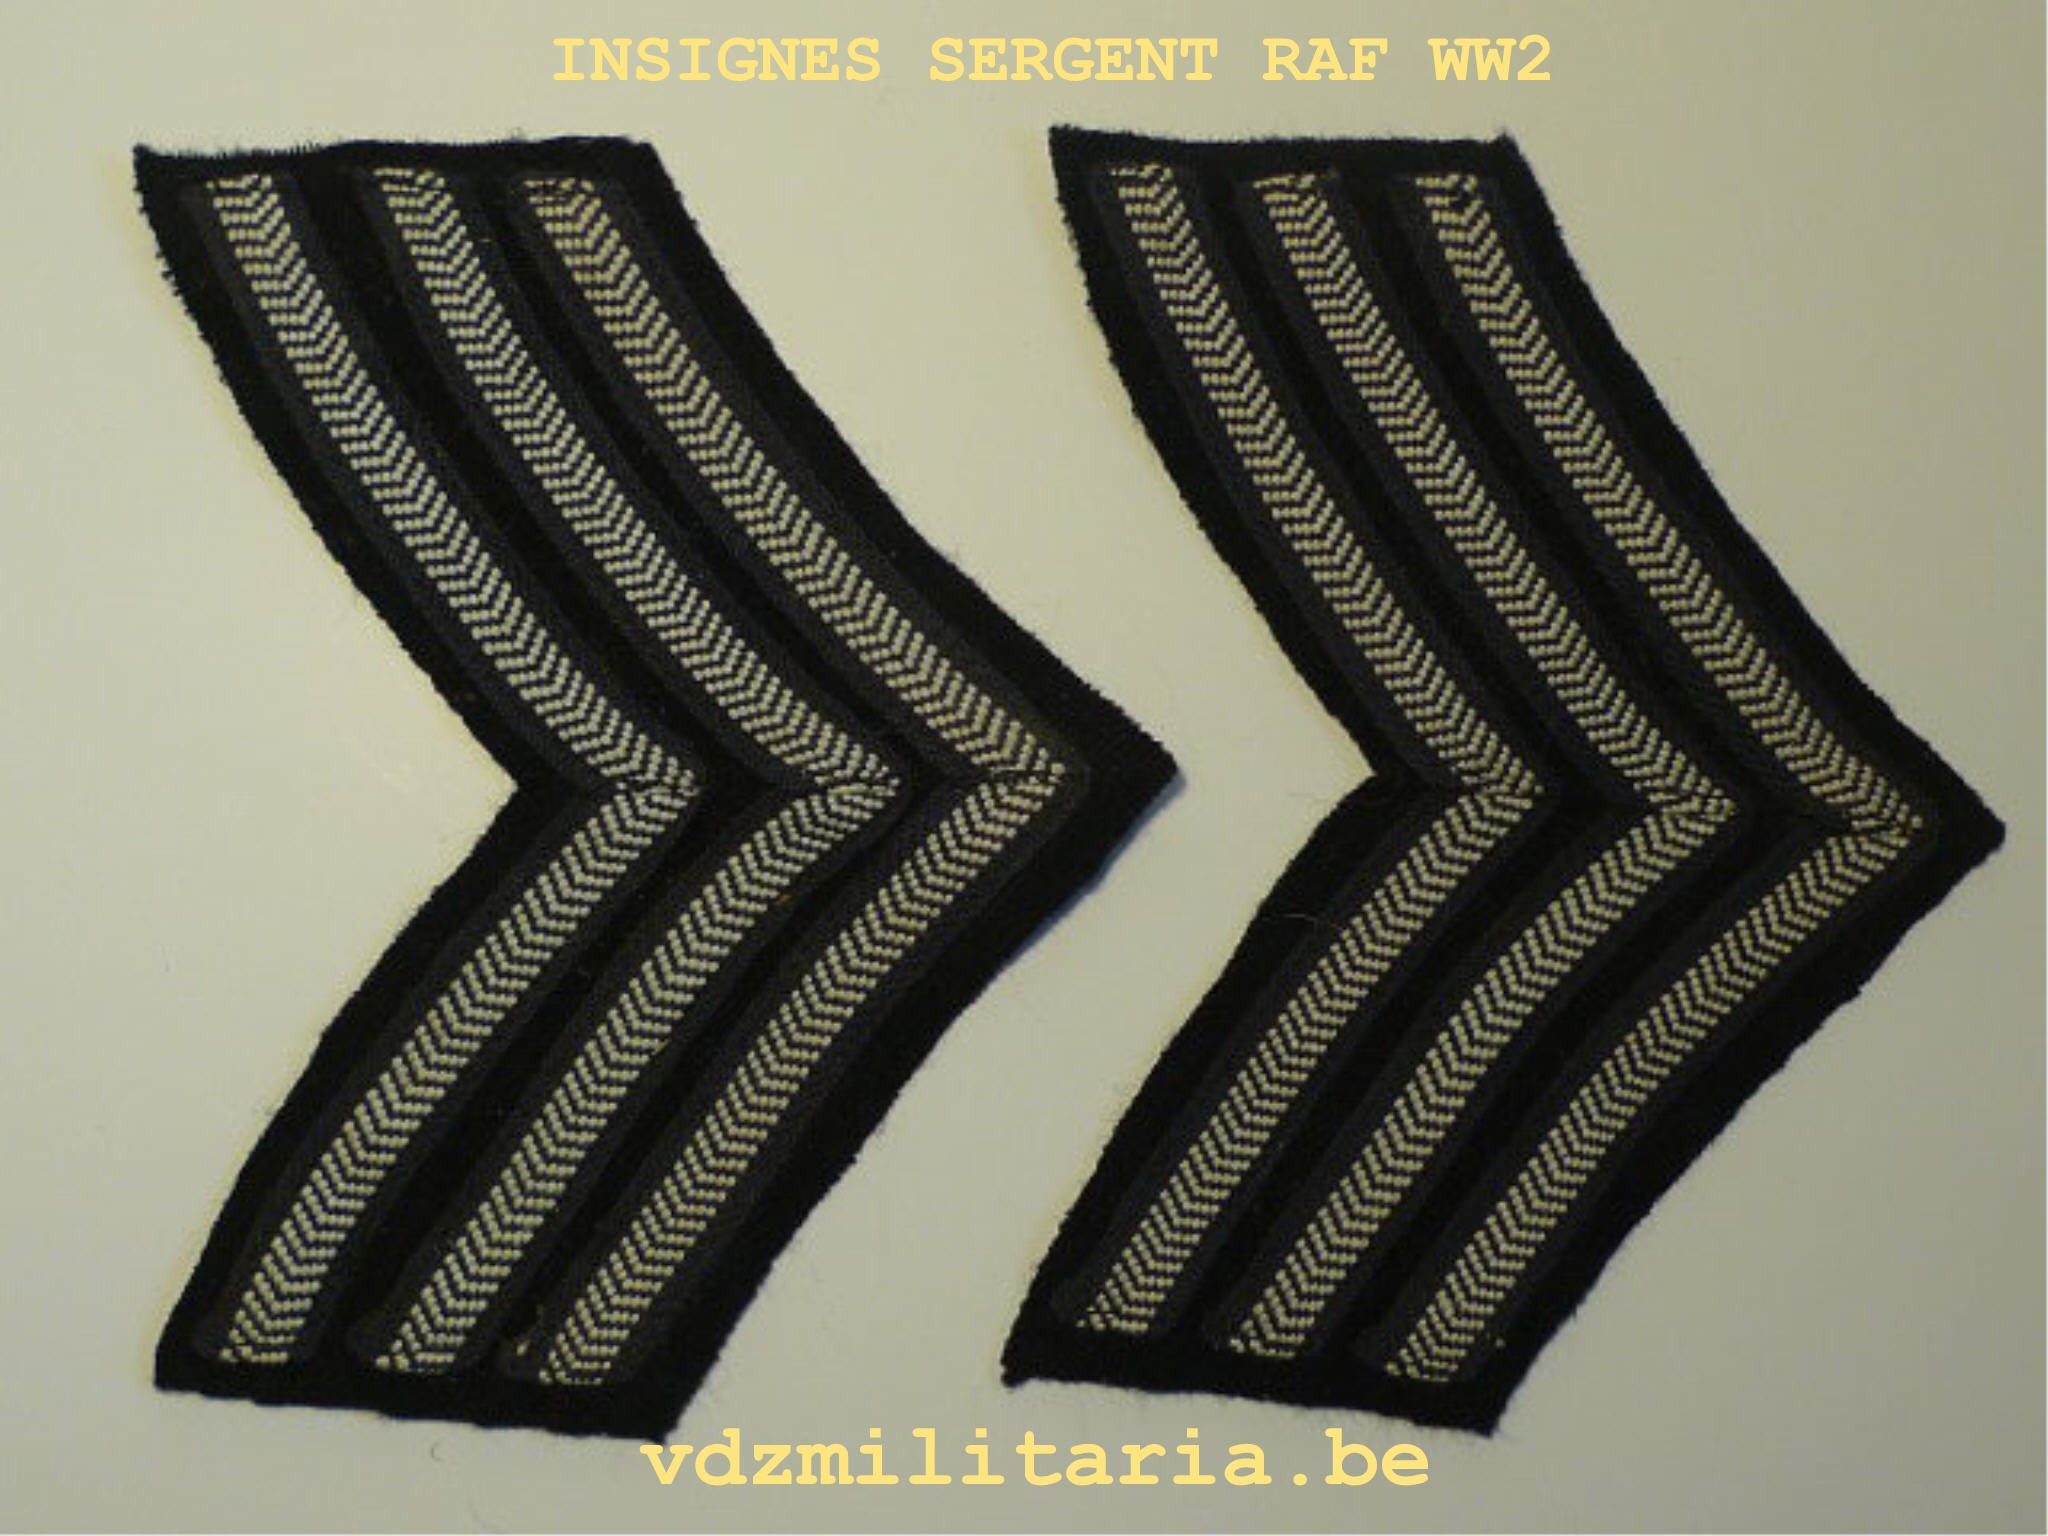 RAF SERGEANT'S CLOTH INSINGNIA WW2 - VDZ-Militaria b v b a